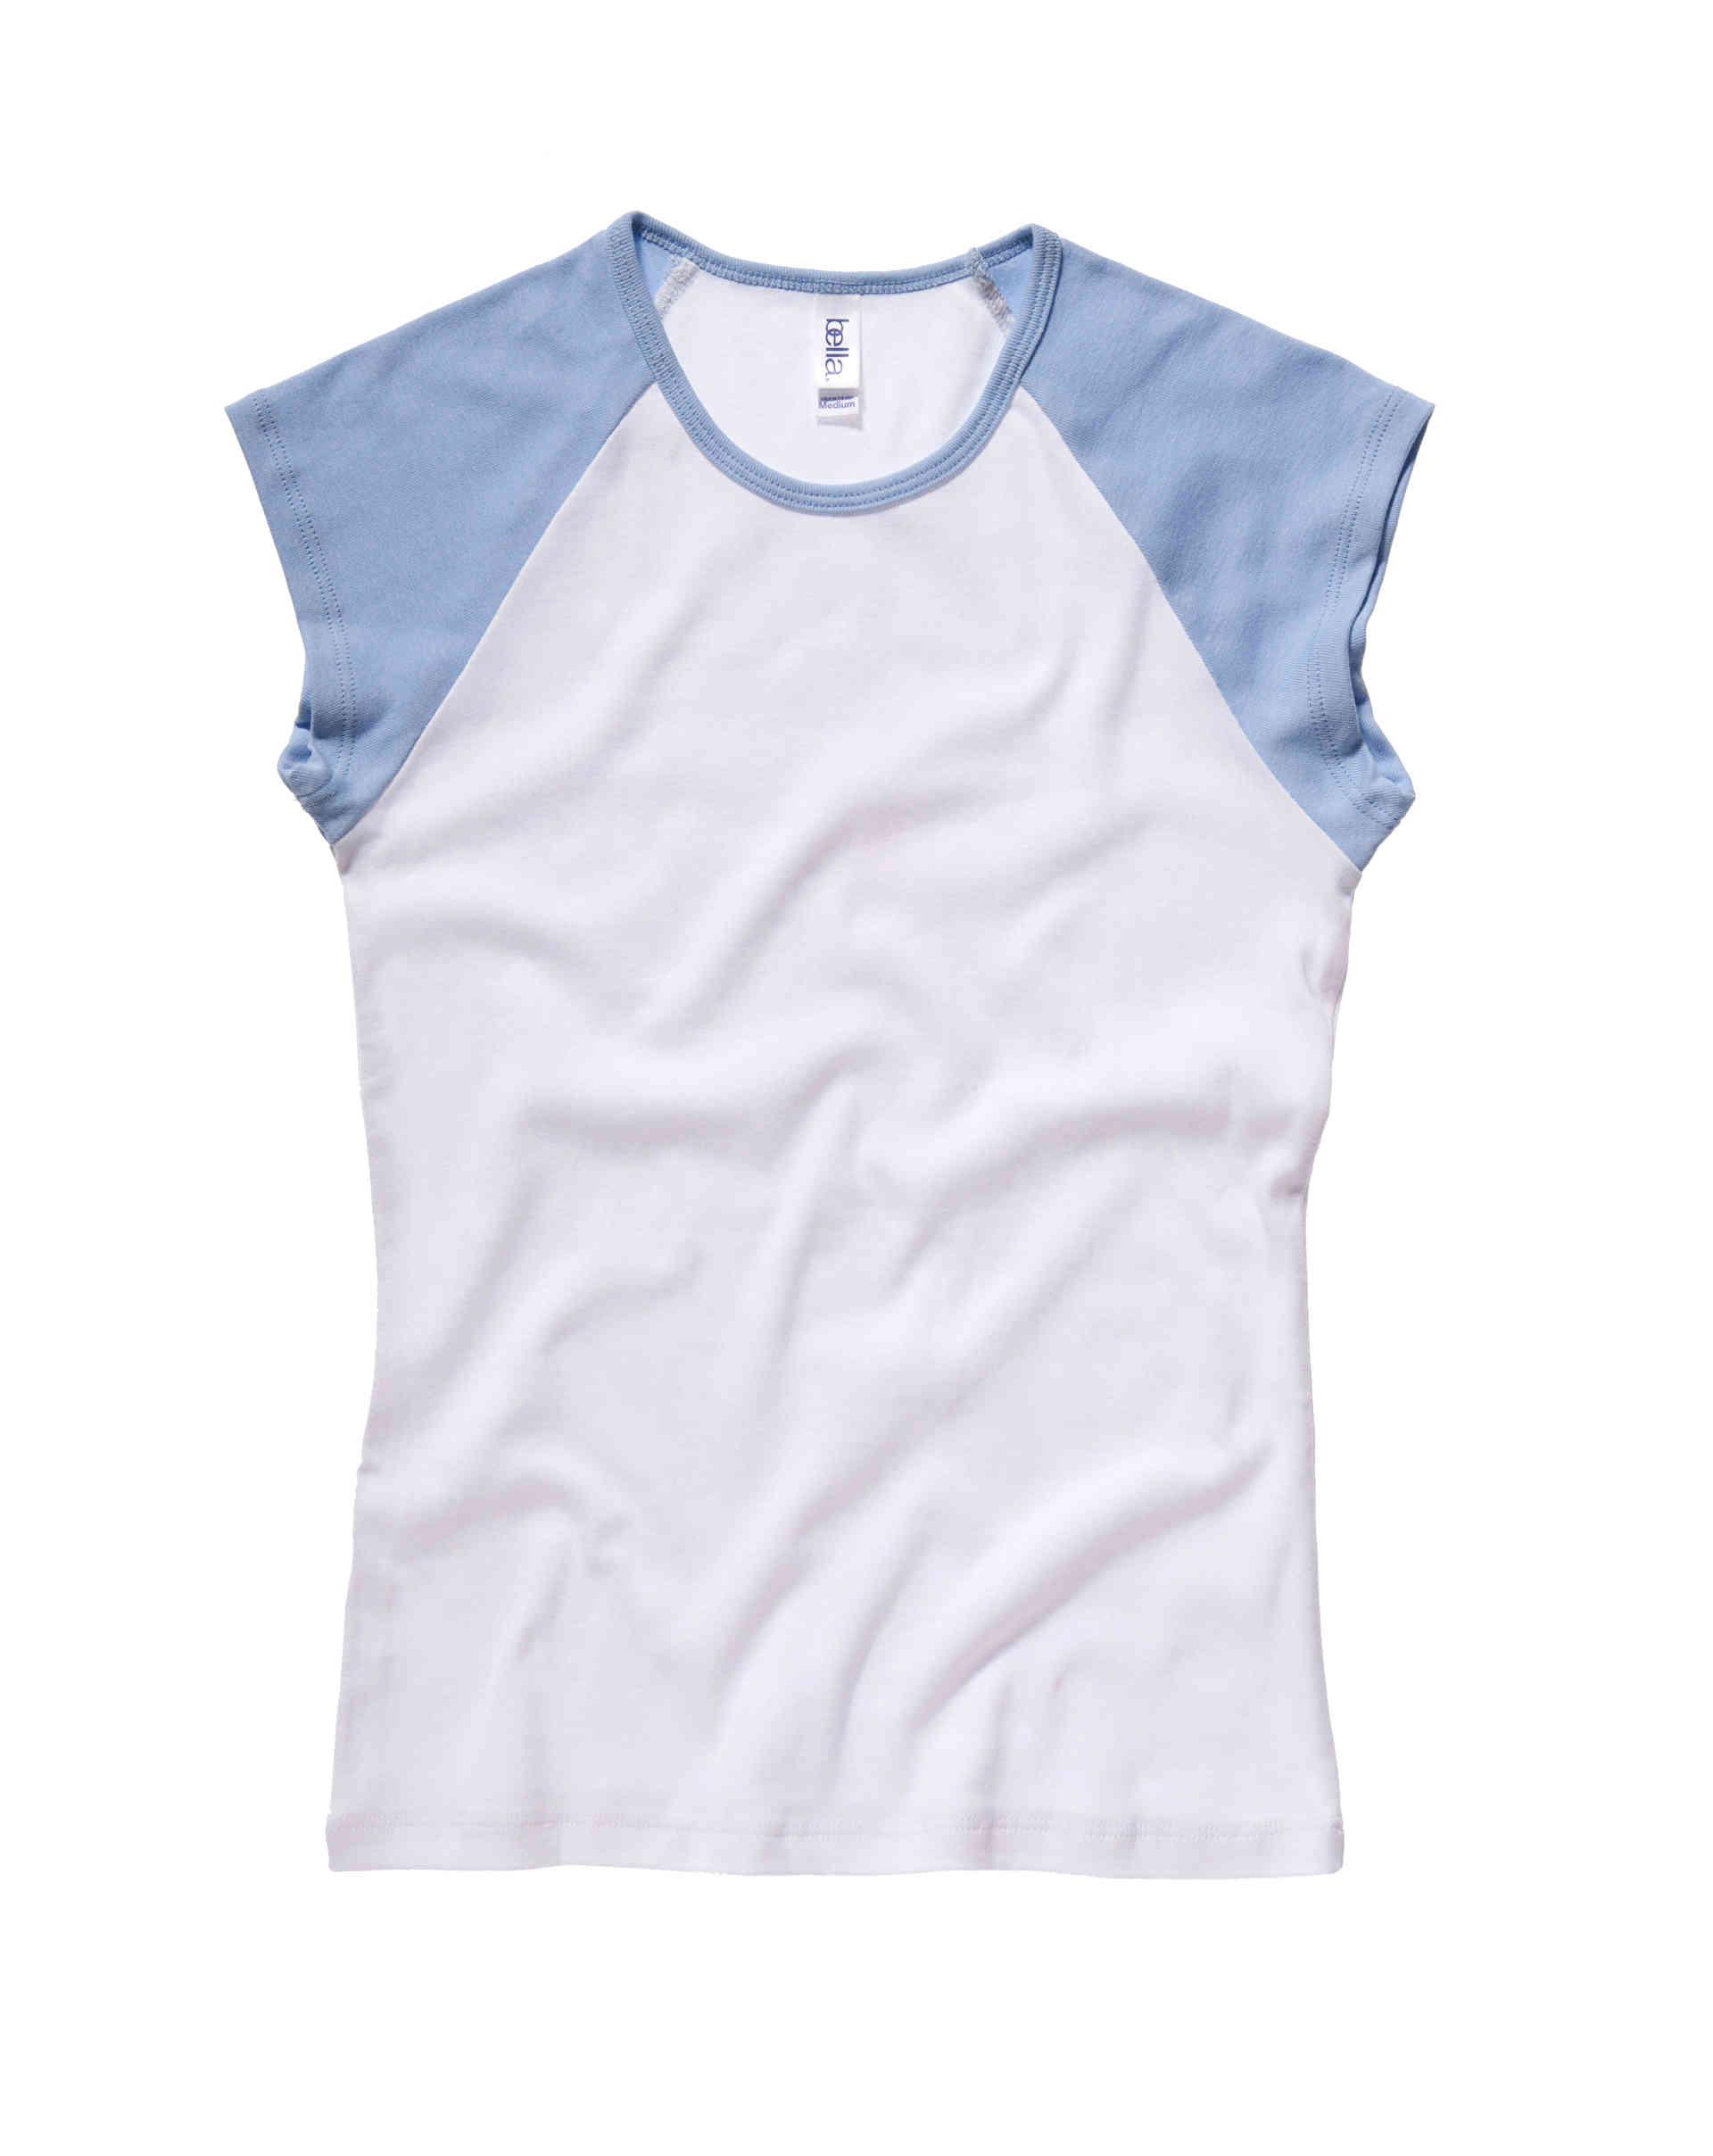 Tee Shirt Personnalis 233 Cap Sleeve Baseball Top Bella